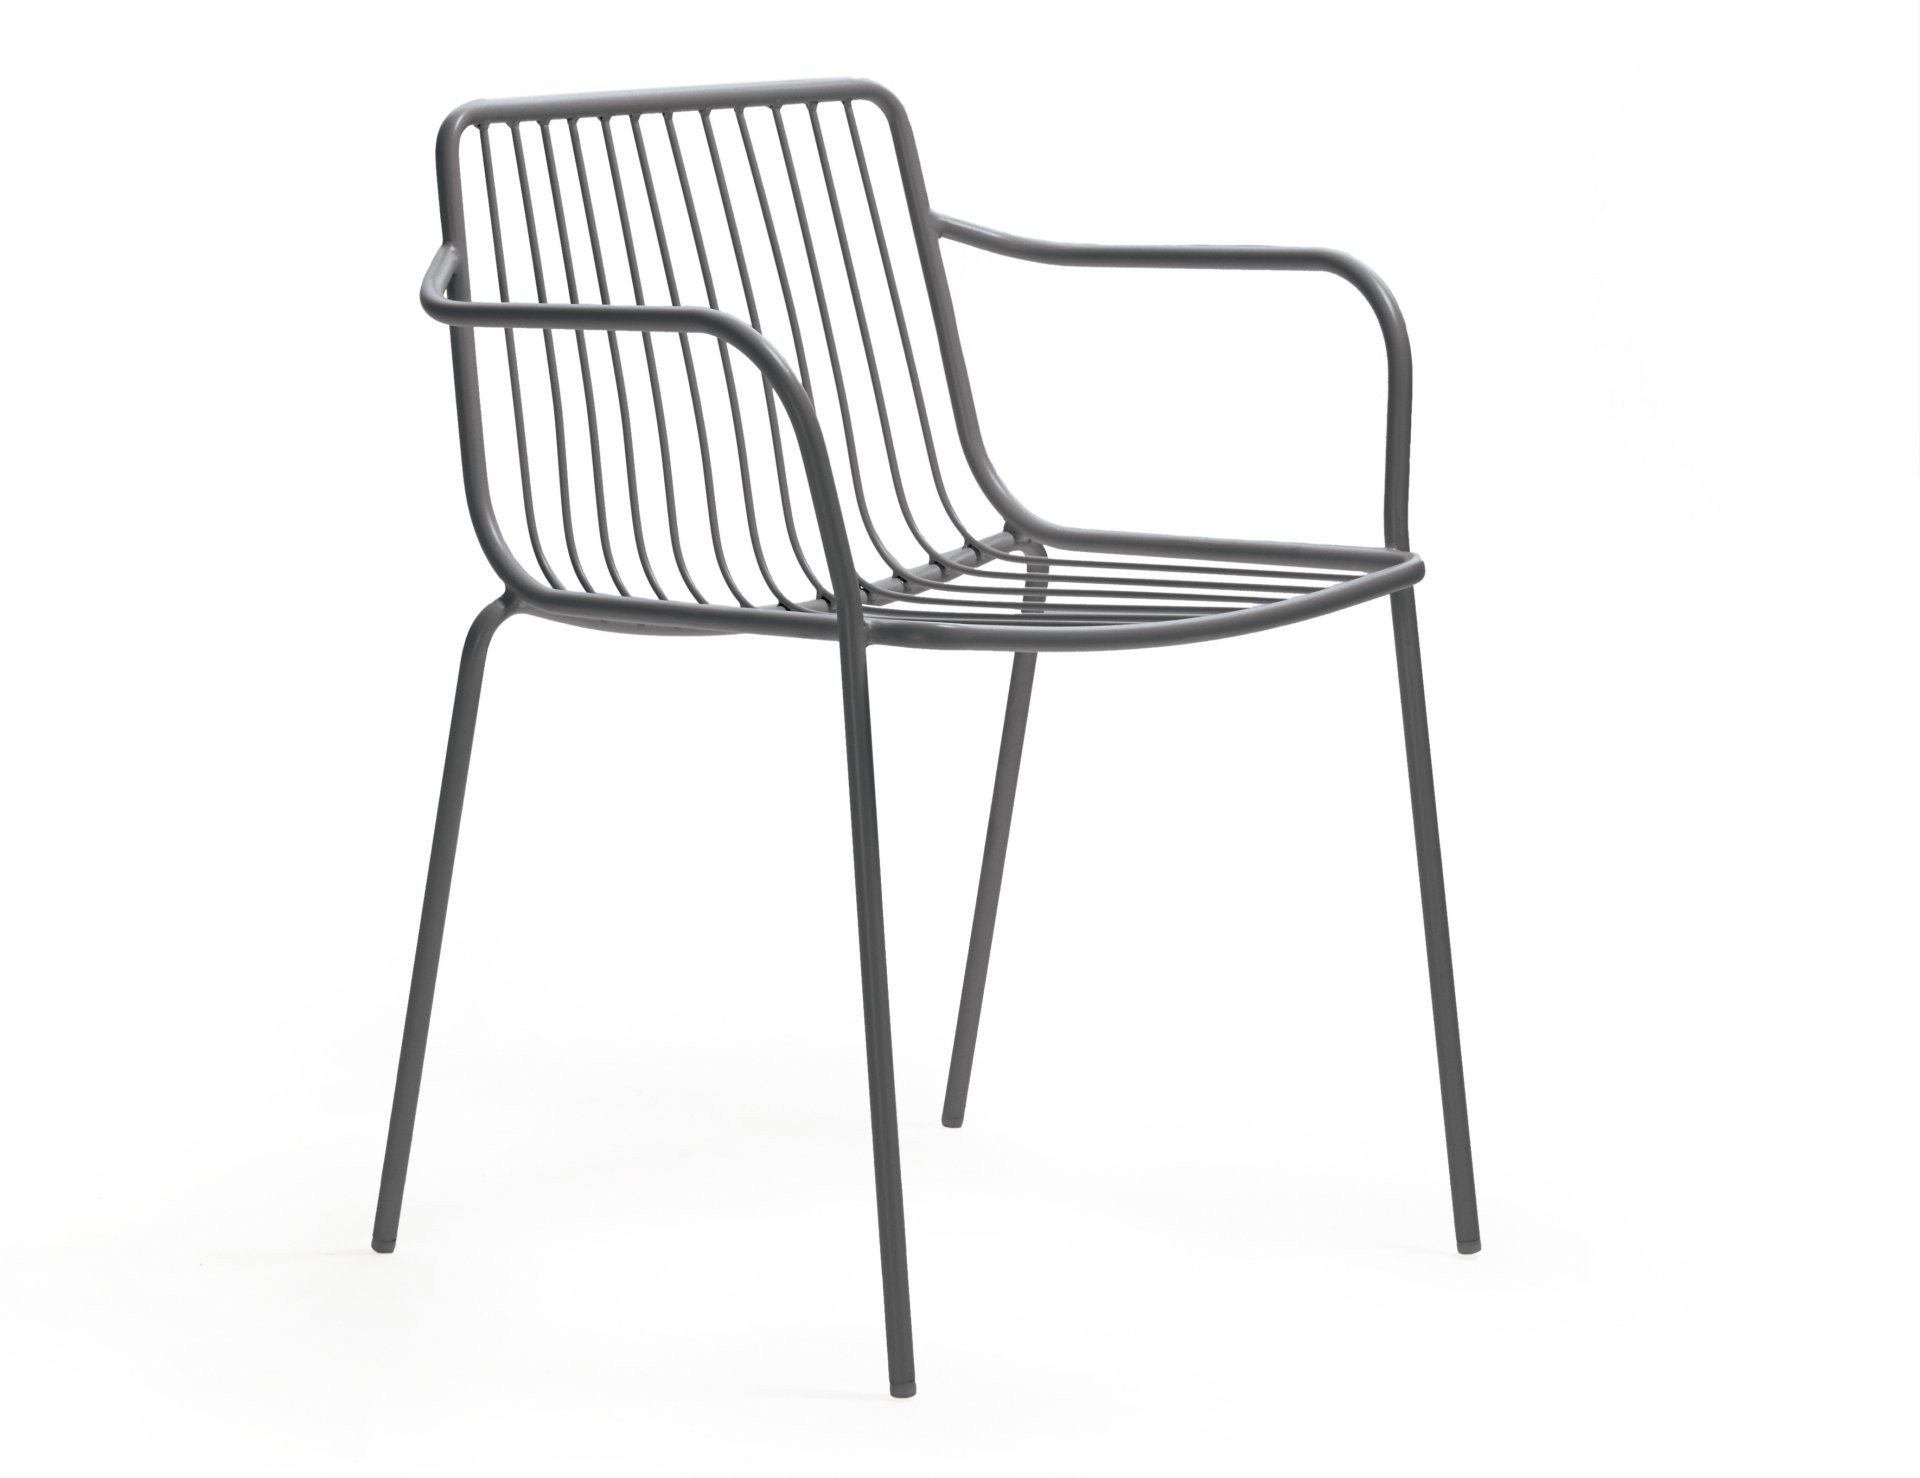 Stuhl Grau Mit Armlehne Metall Stapelbar Gartenstuhl Grau Metall